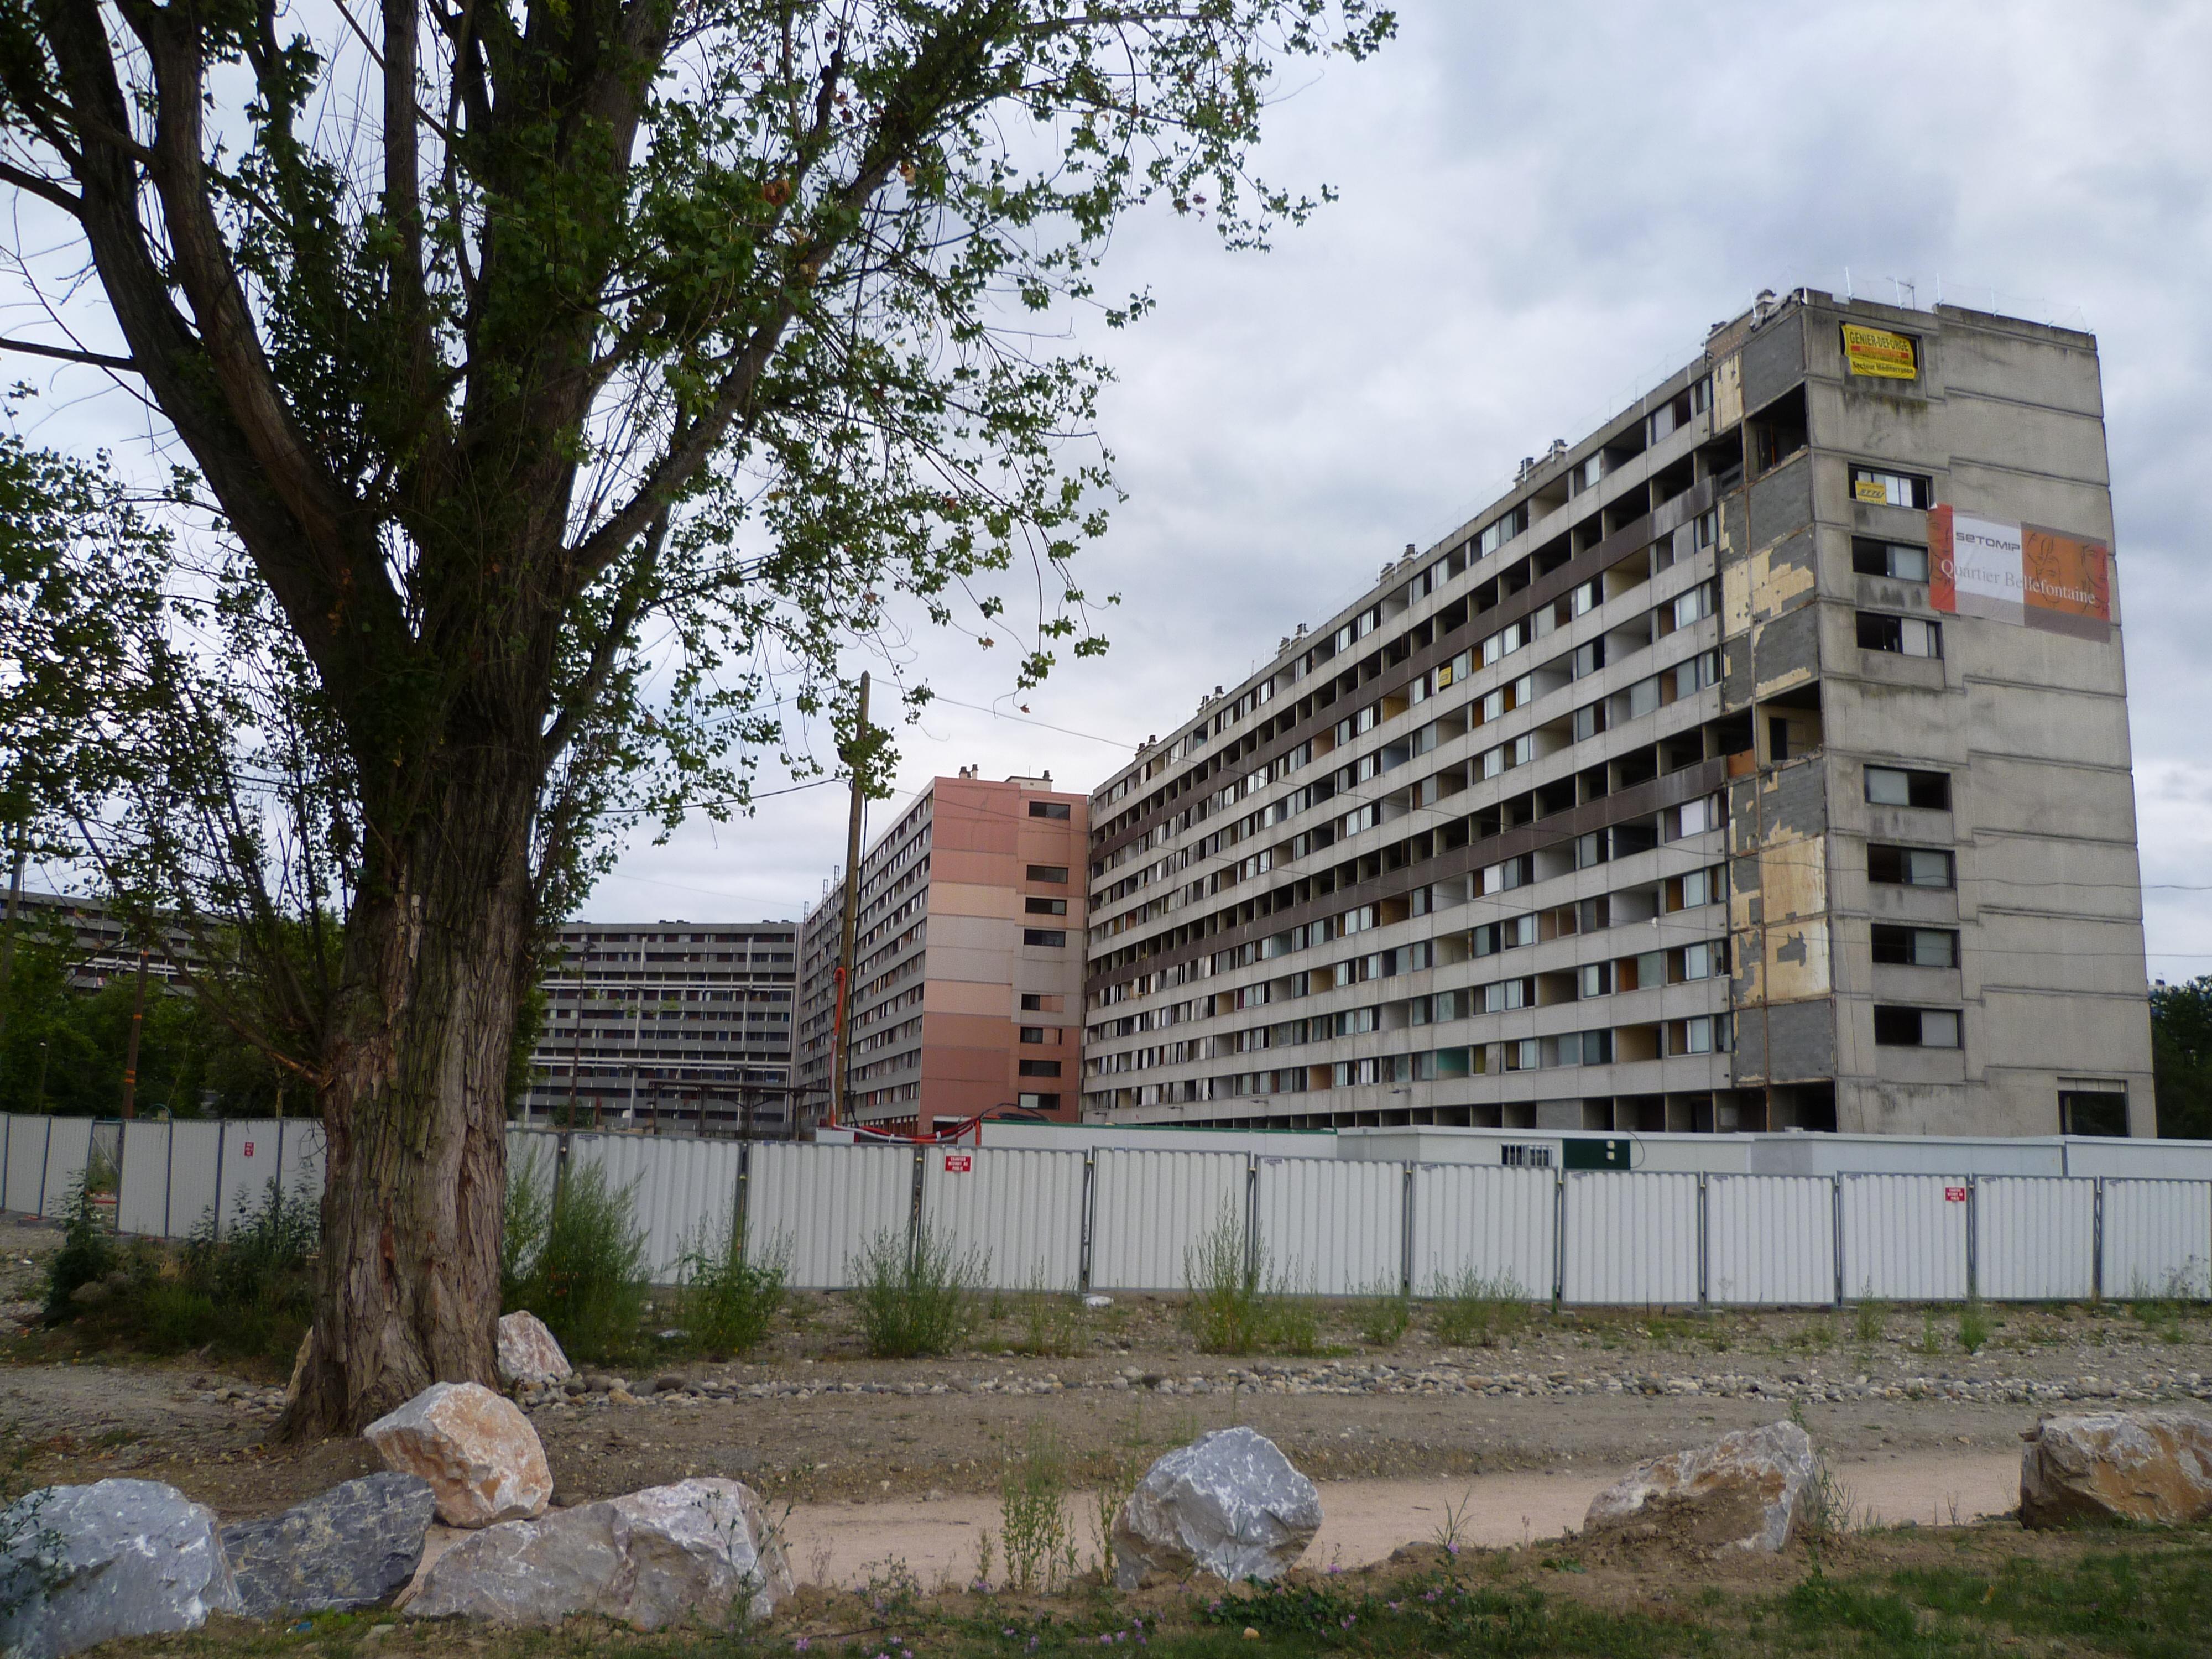 File:Toulouse - Immeubles à Bellefontaine 2.jpg